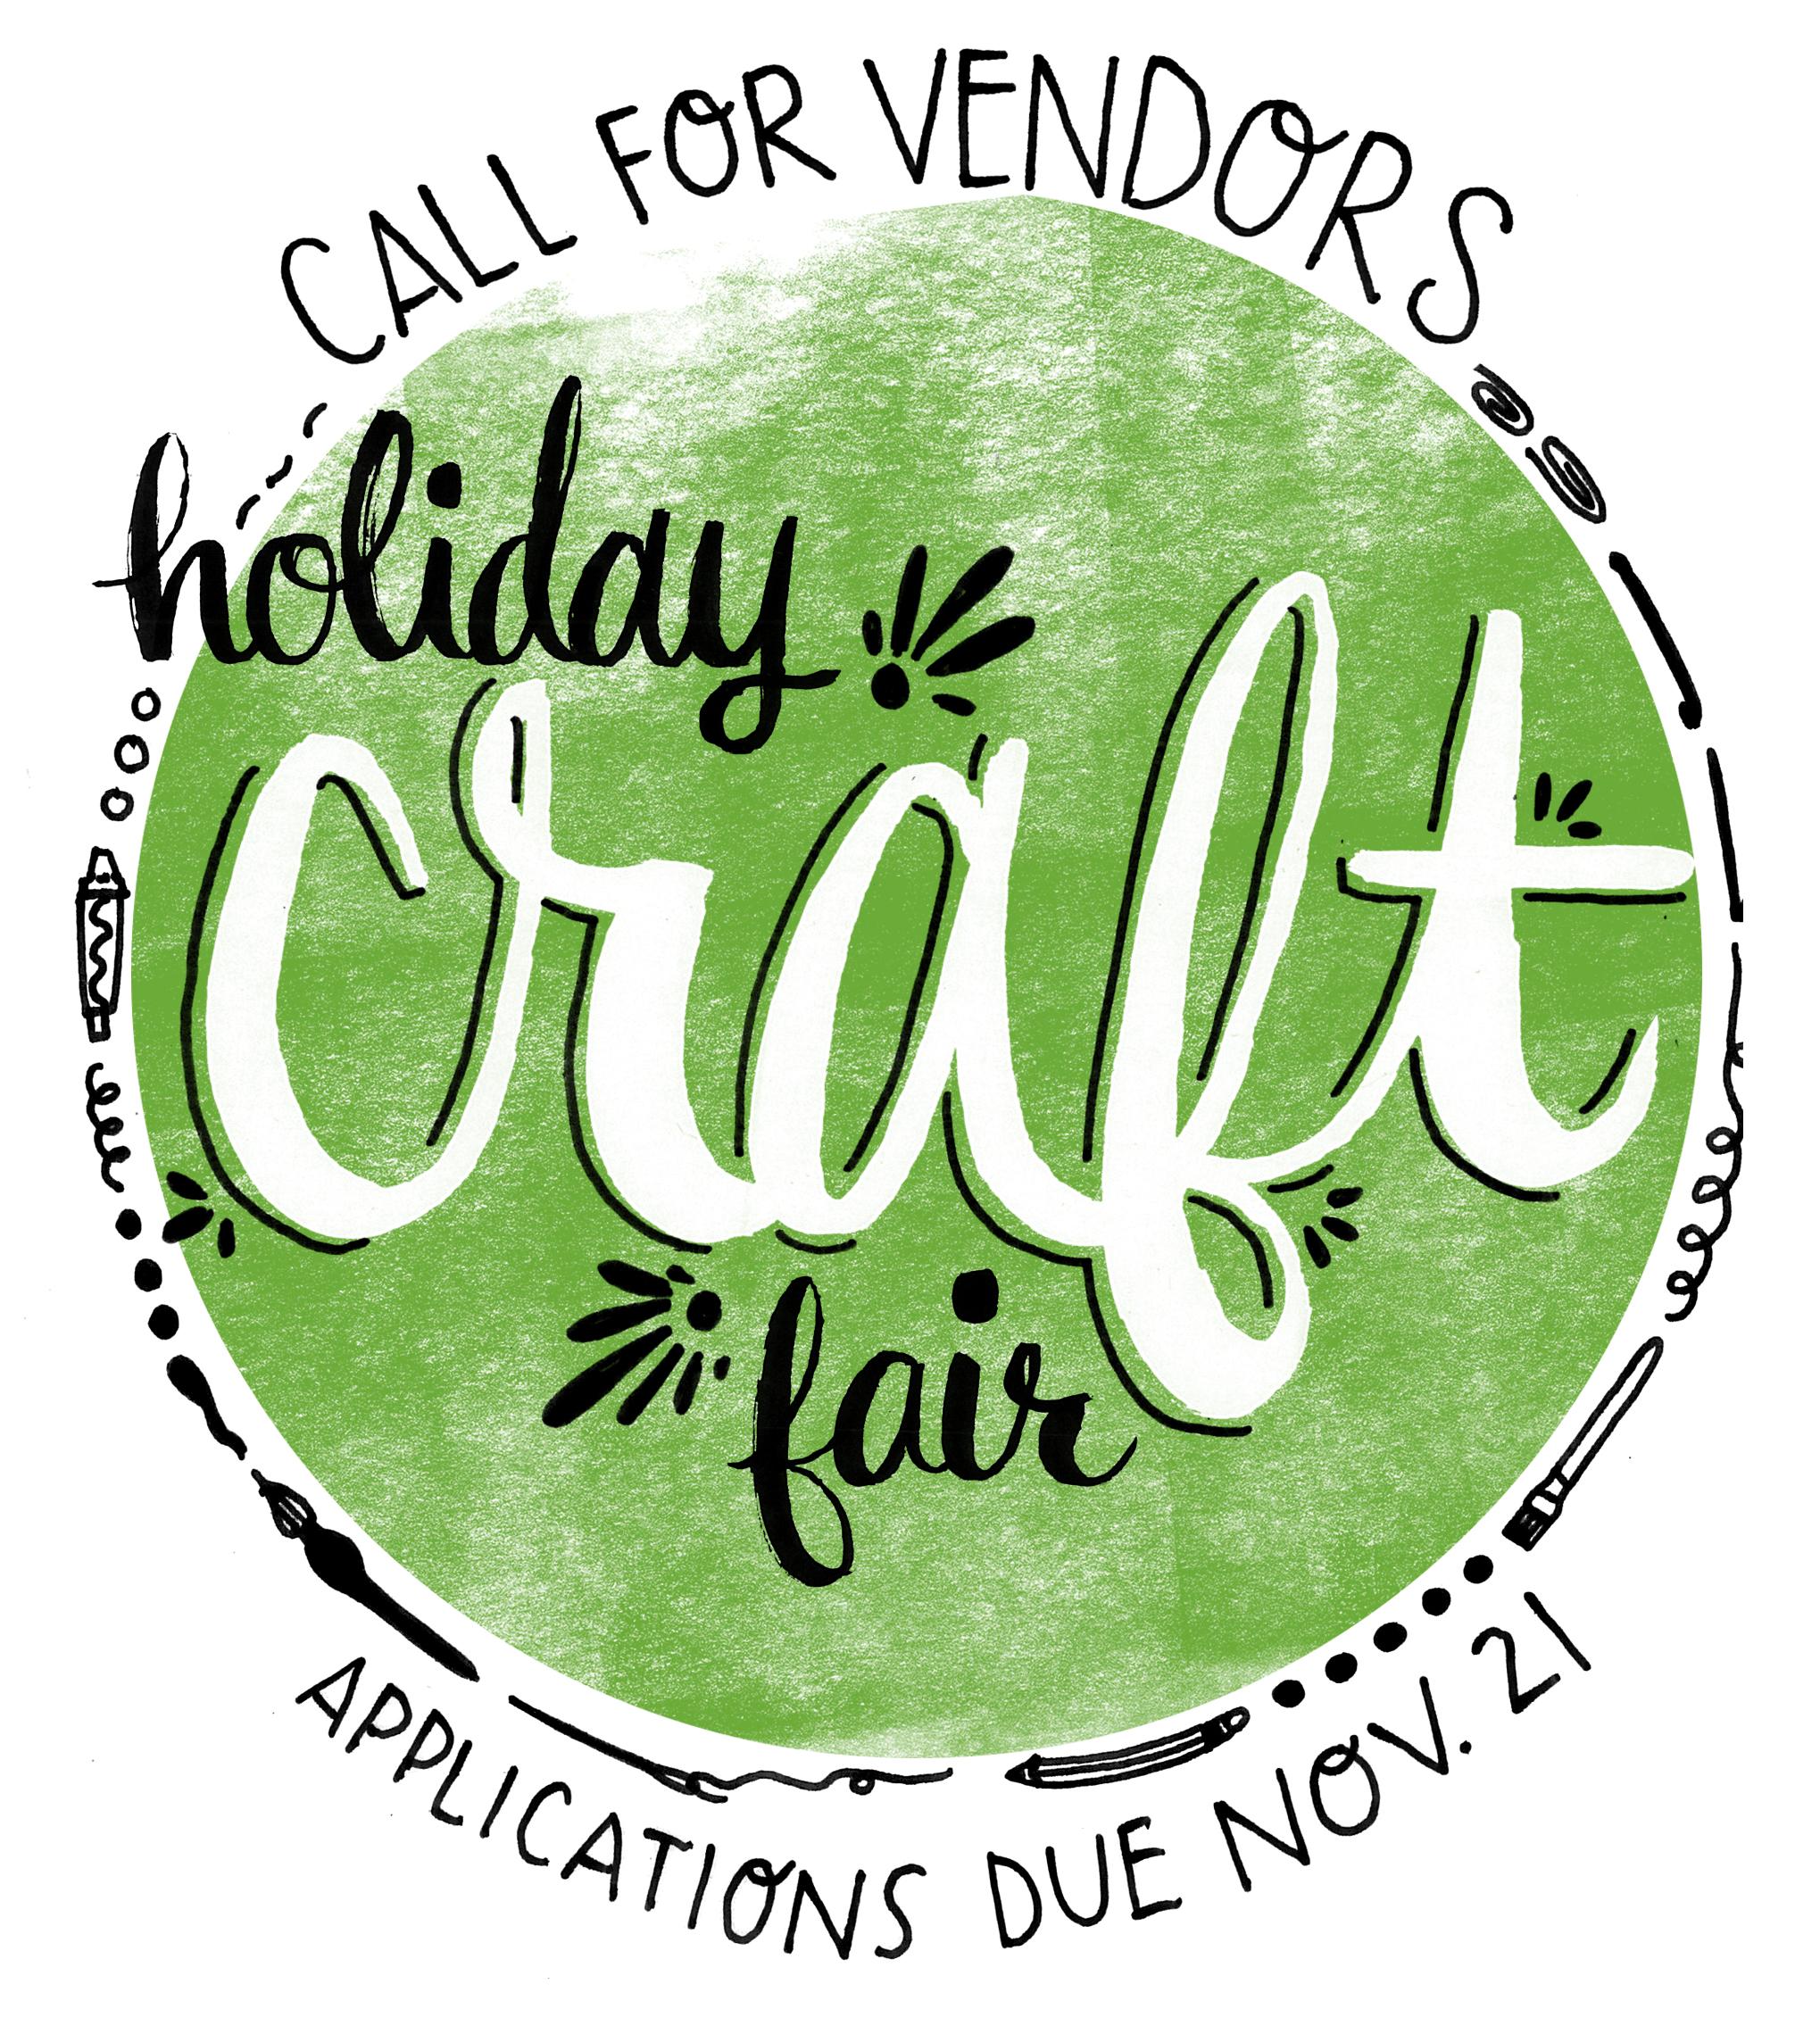 craft fair call for vendors.jpg